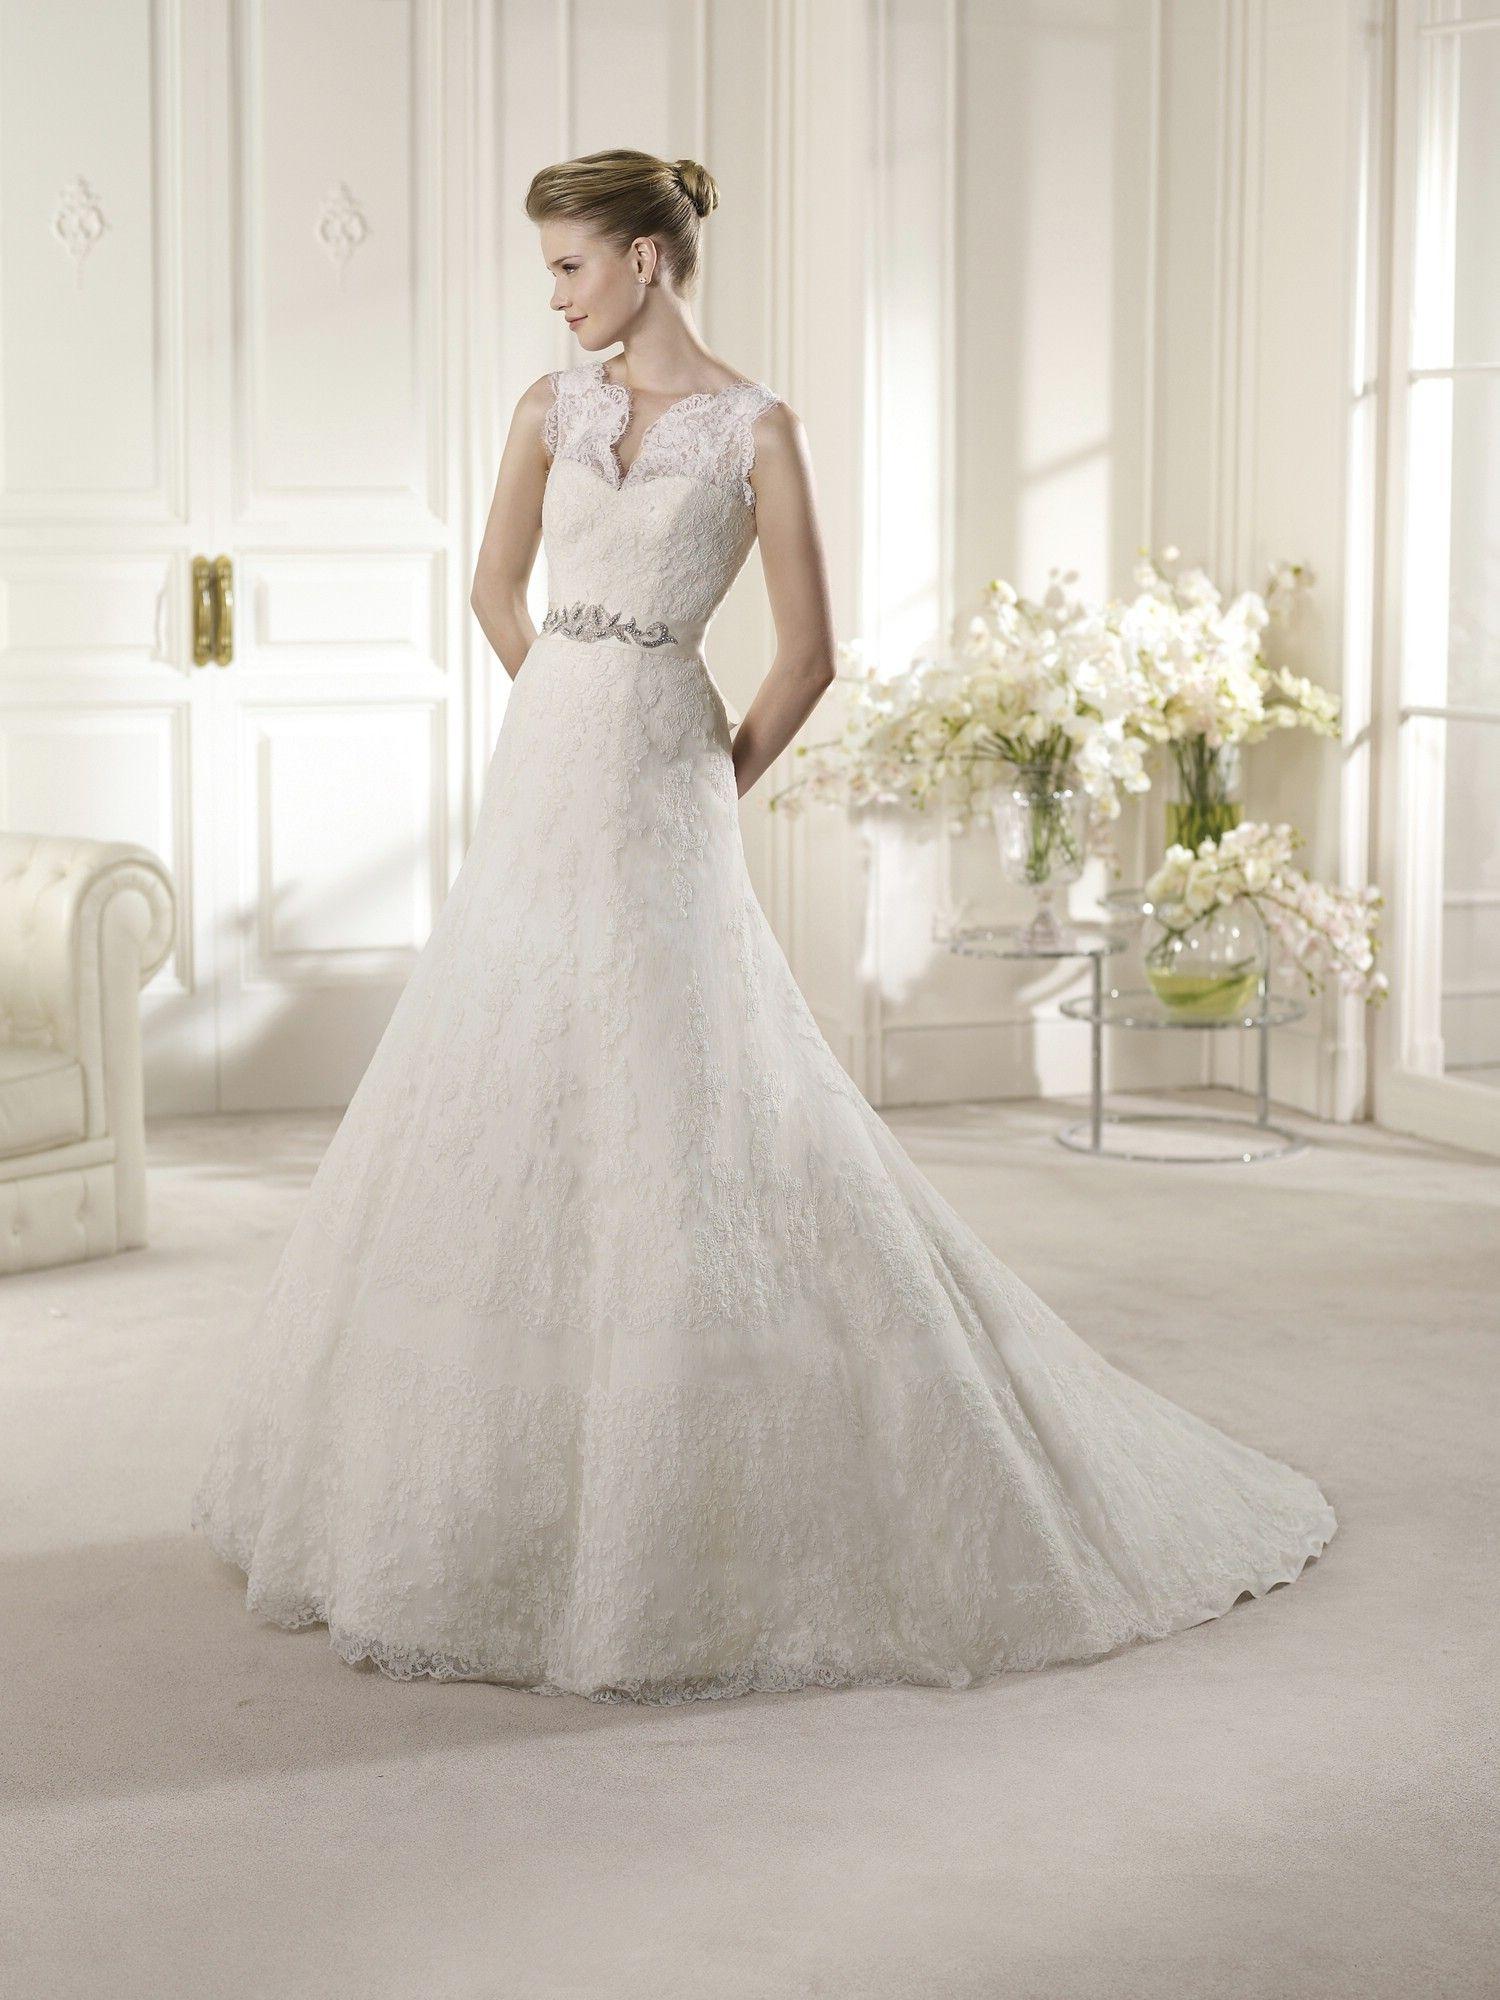 Pronovias Amman - New Wedding Dresses | Pronovias bridal, Wedding ...